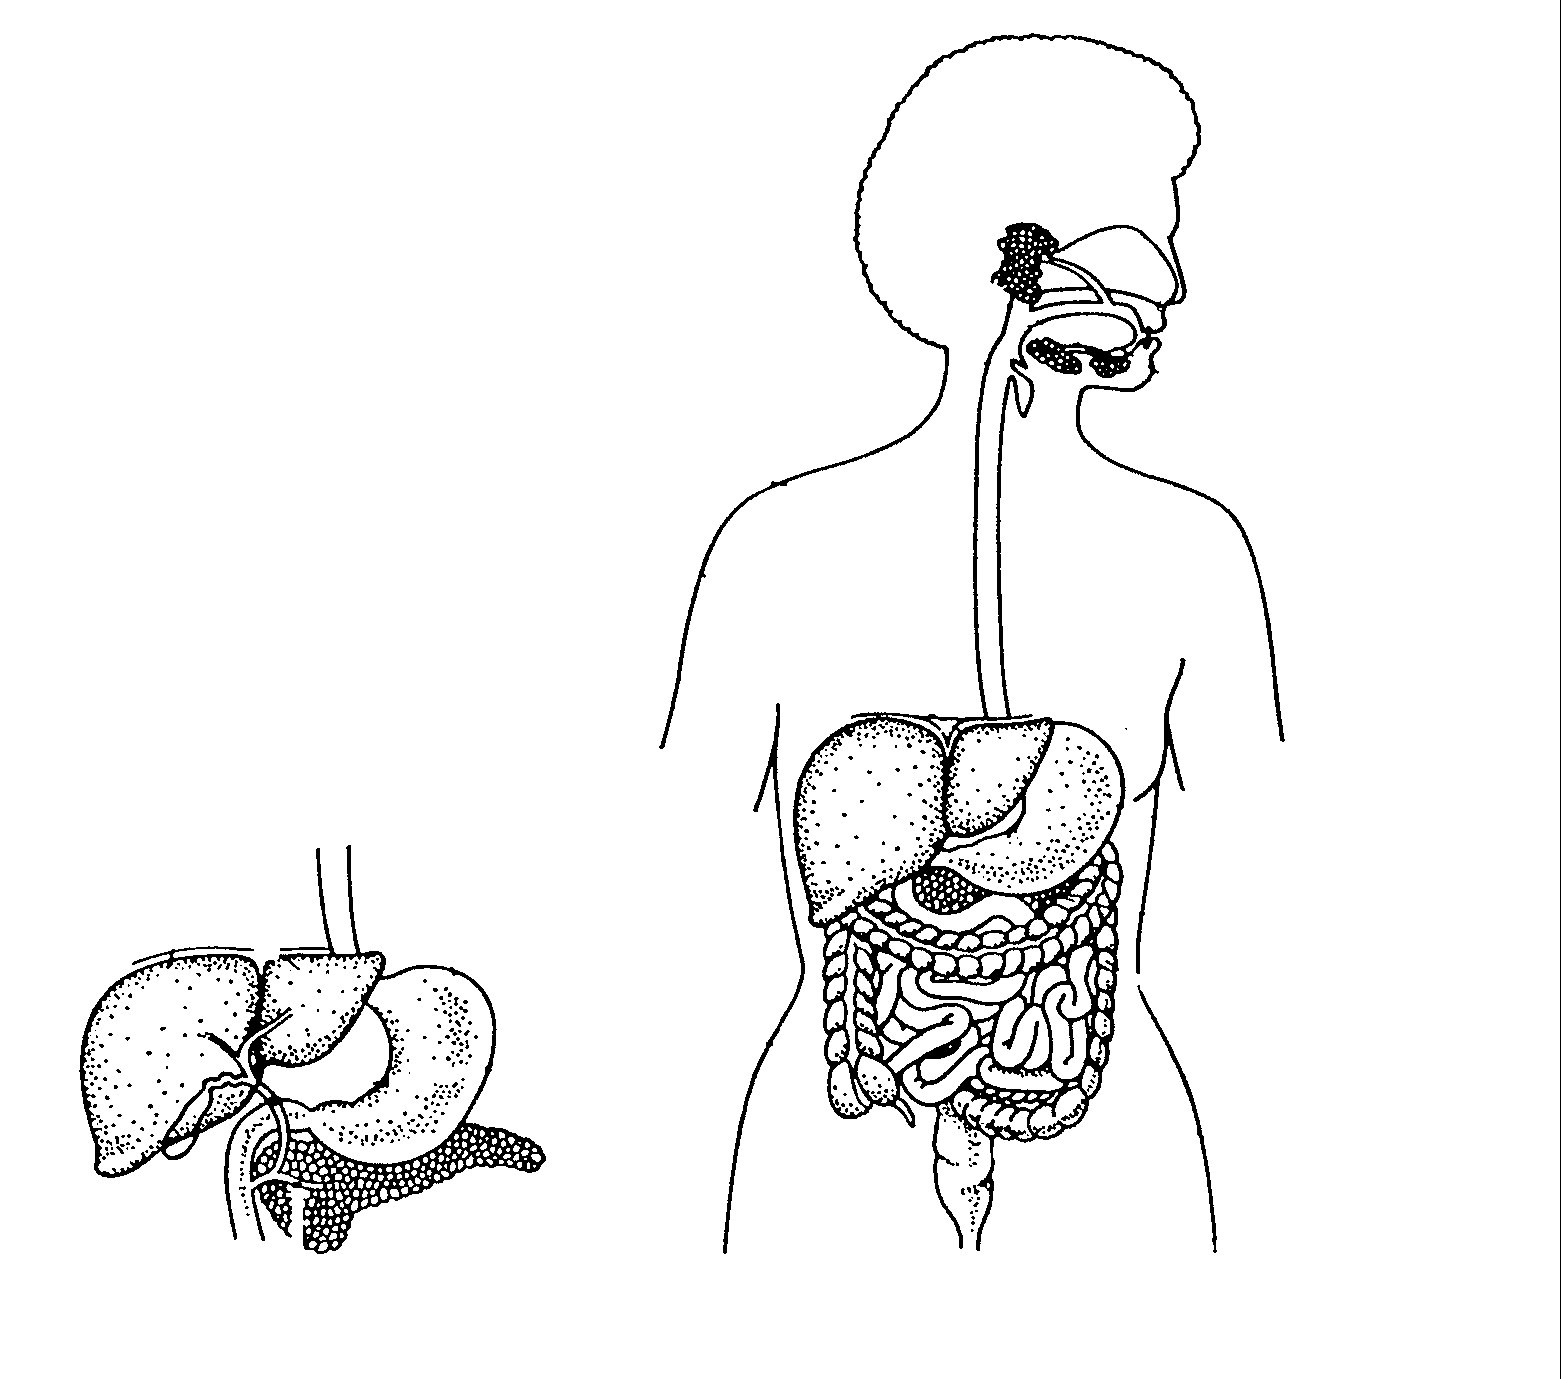 Label Human Digestive System